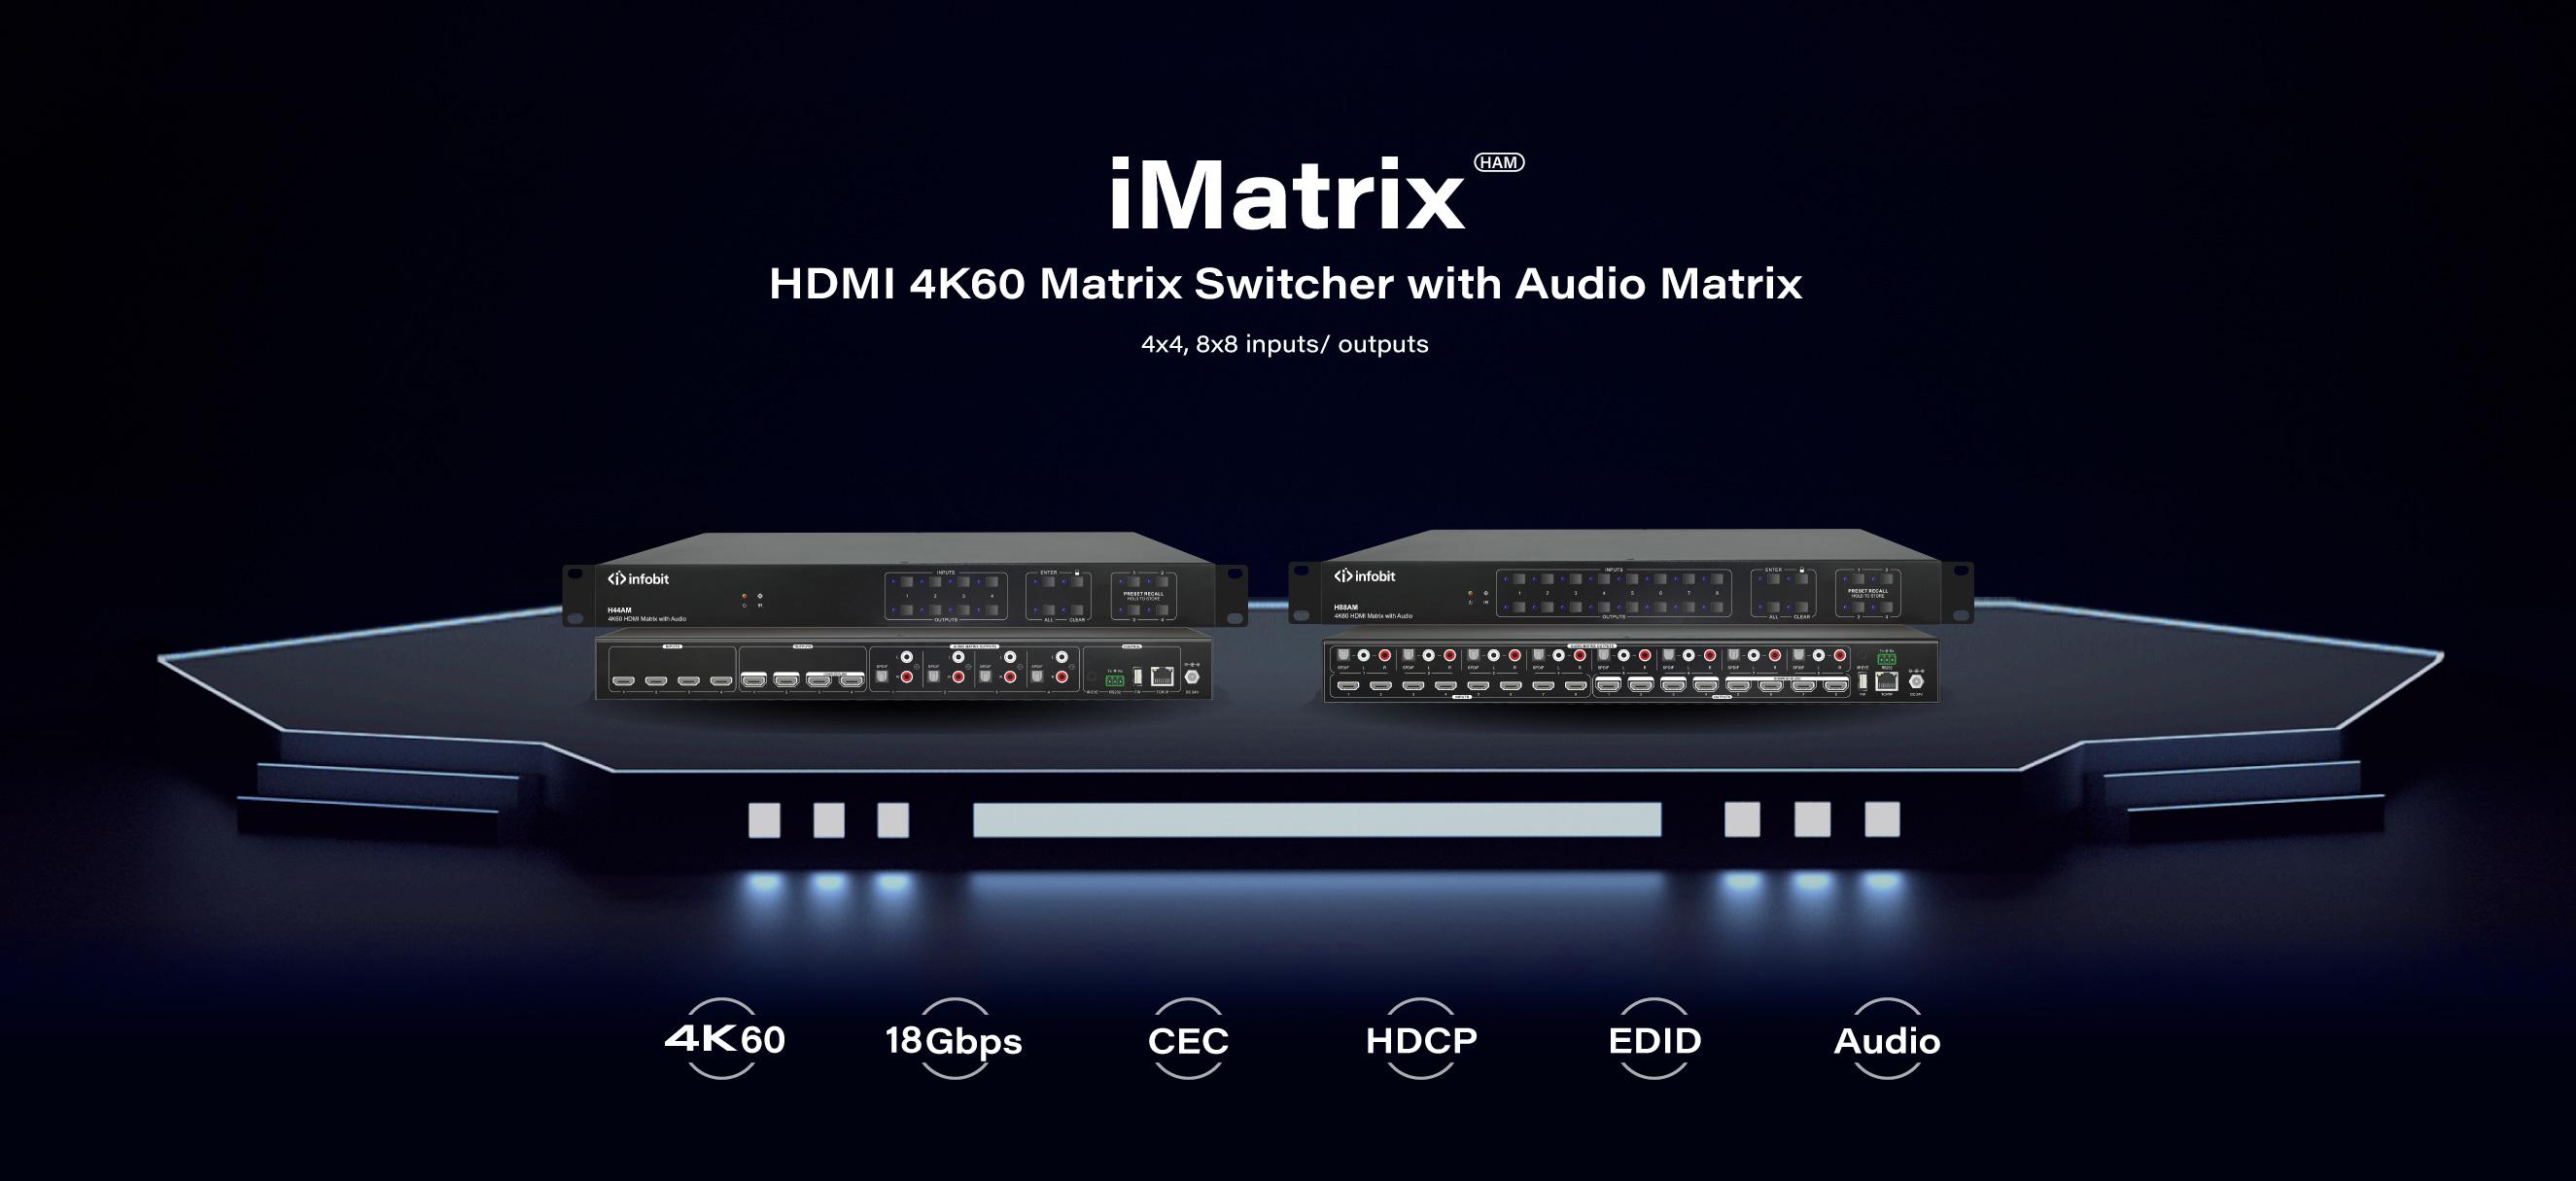 iMatrix HAM HDMI 4K matrix switcher with audio